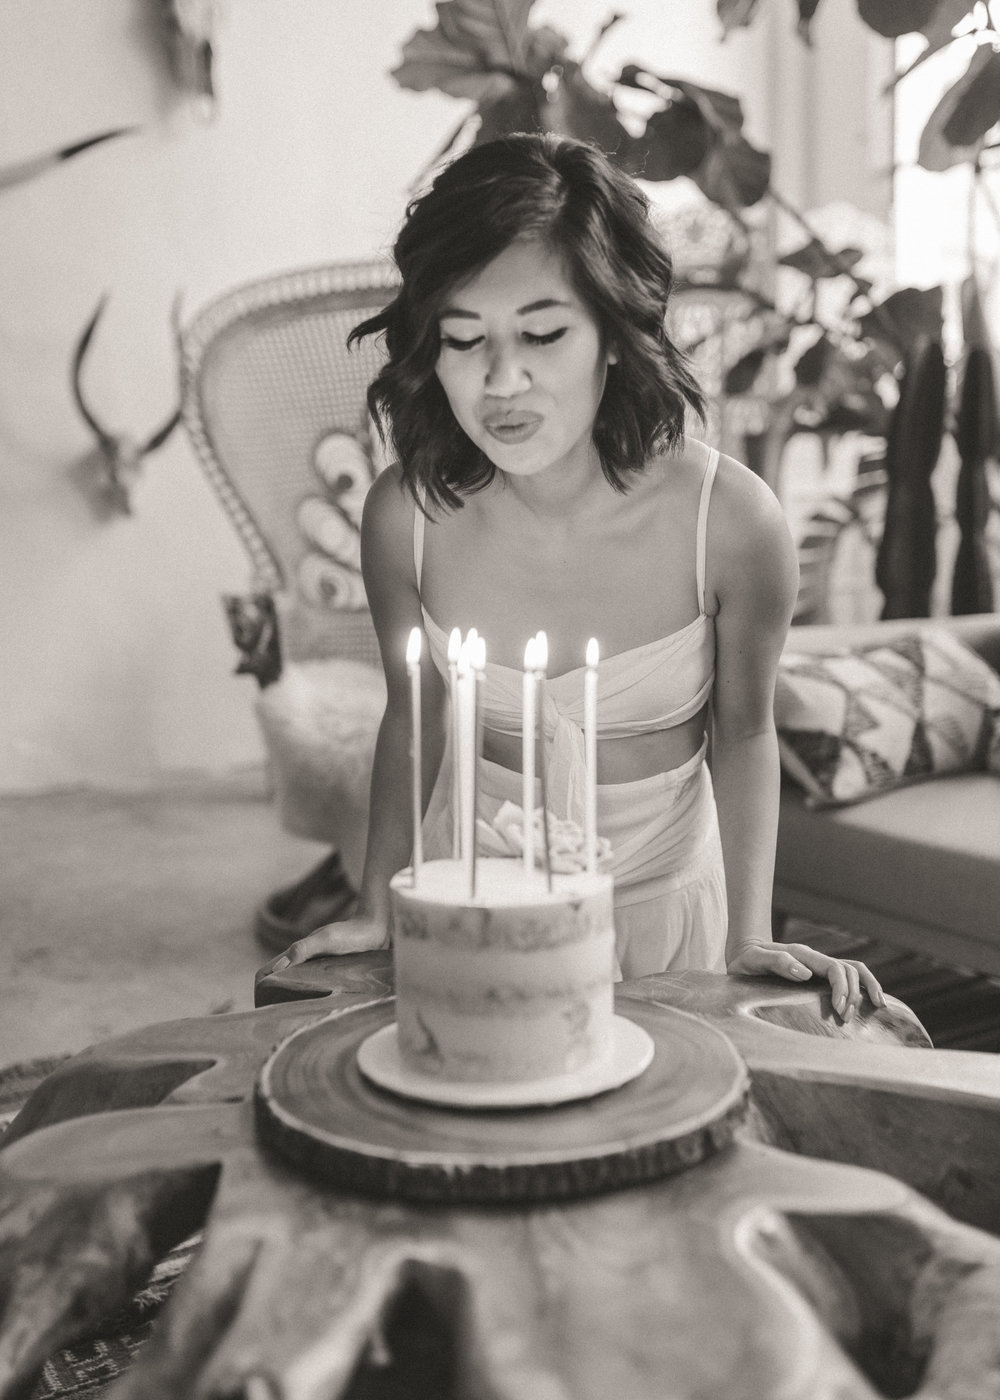 lisa-linh-31st-birthday-brunch-by-lisa-linh